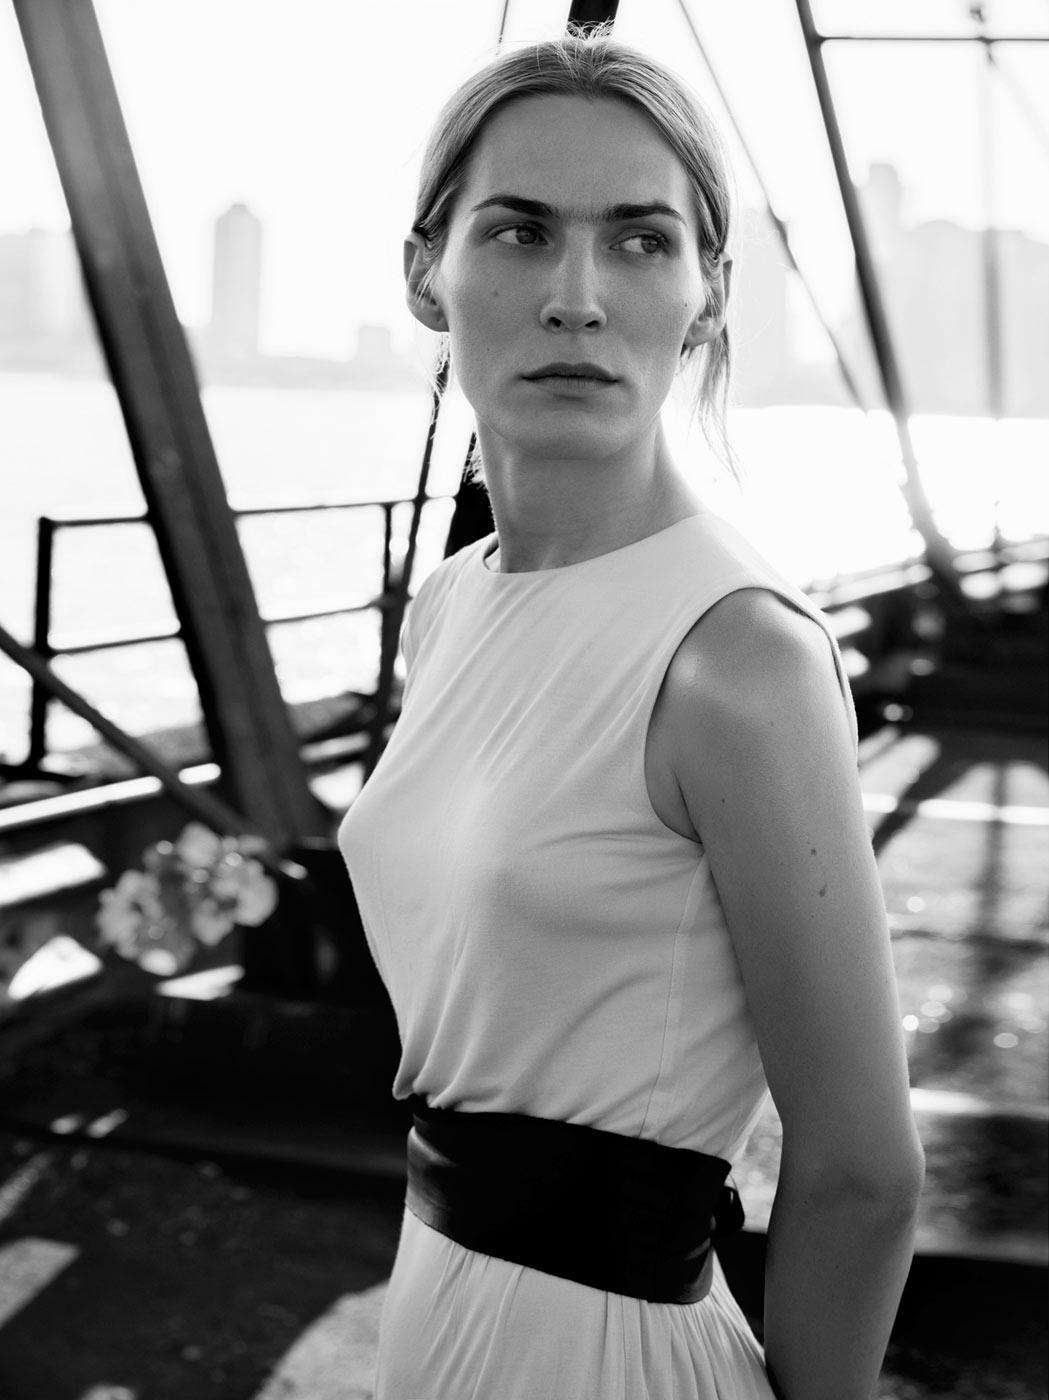 Michelle Stekowski